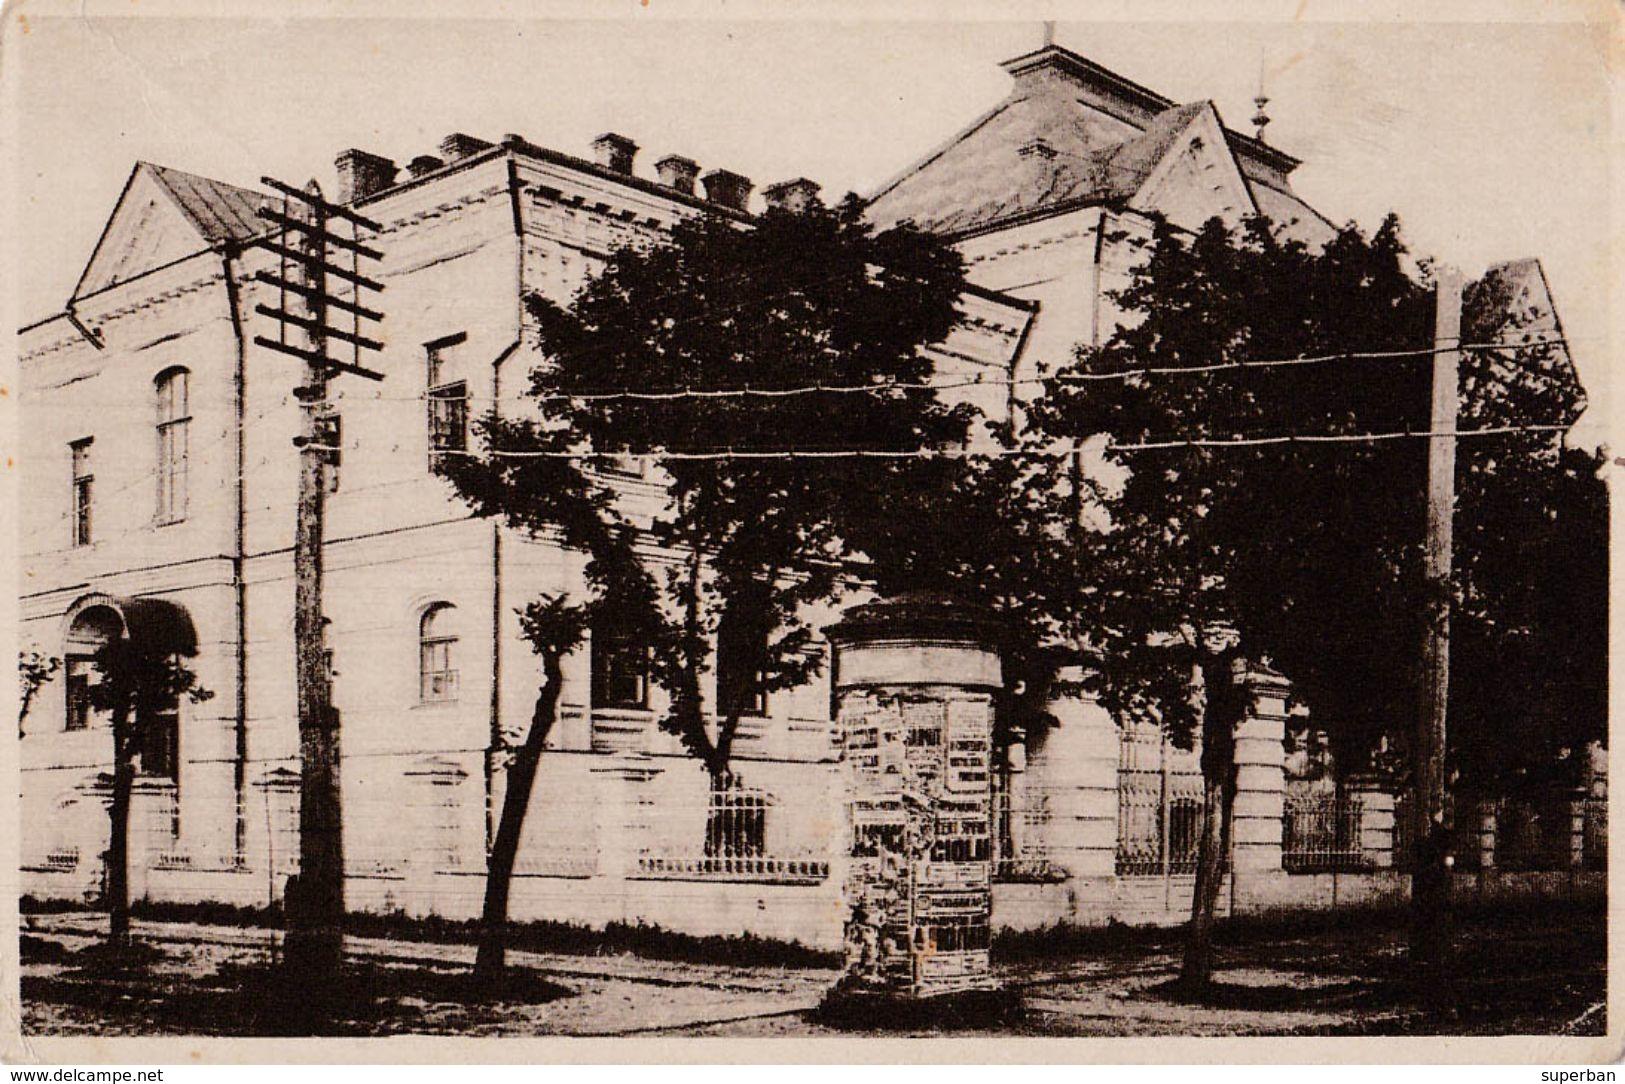 CHISINAU [ MOLDAVIE / ROUMANIE ] - FACULTATEA TEOLOGICA / THEOLOGICAL FACULTY - ANNÉE / YEAR ~ 1930 - RARE !!! (w-500) - Moldavie